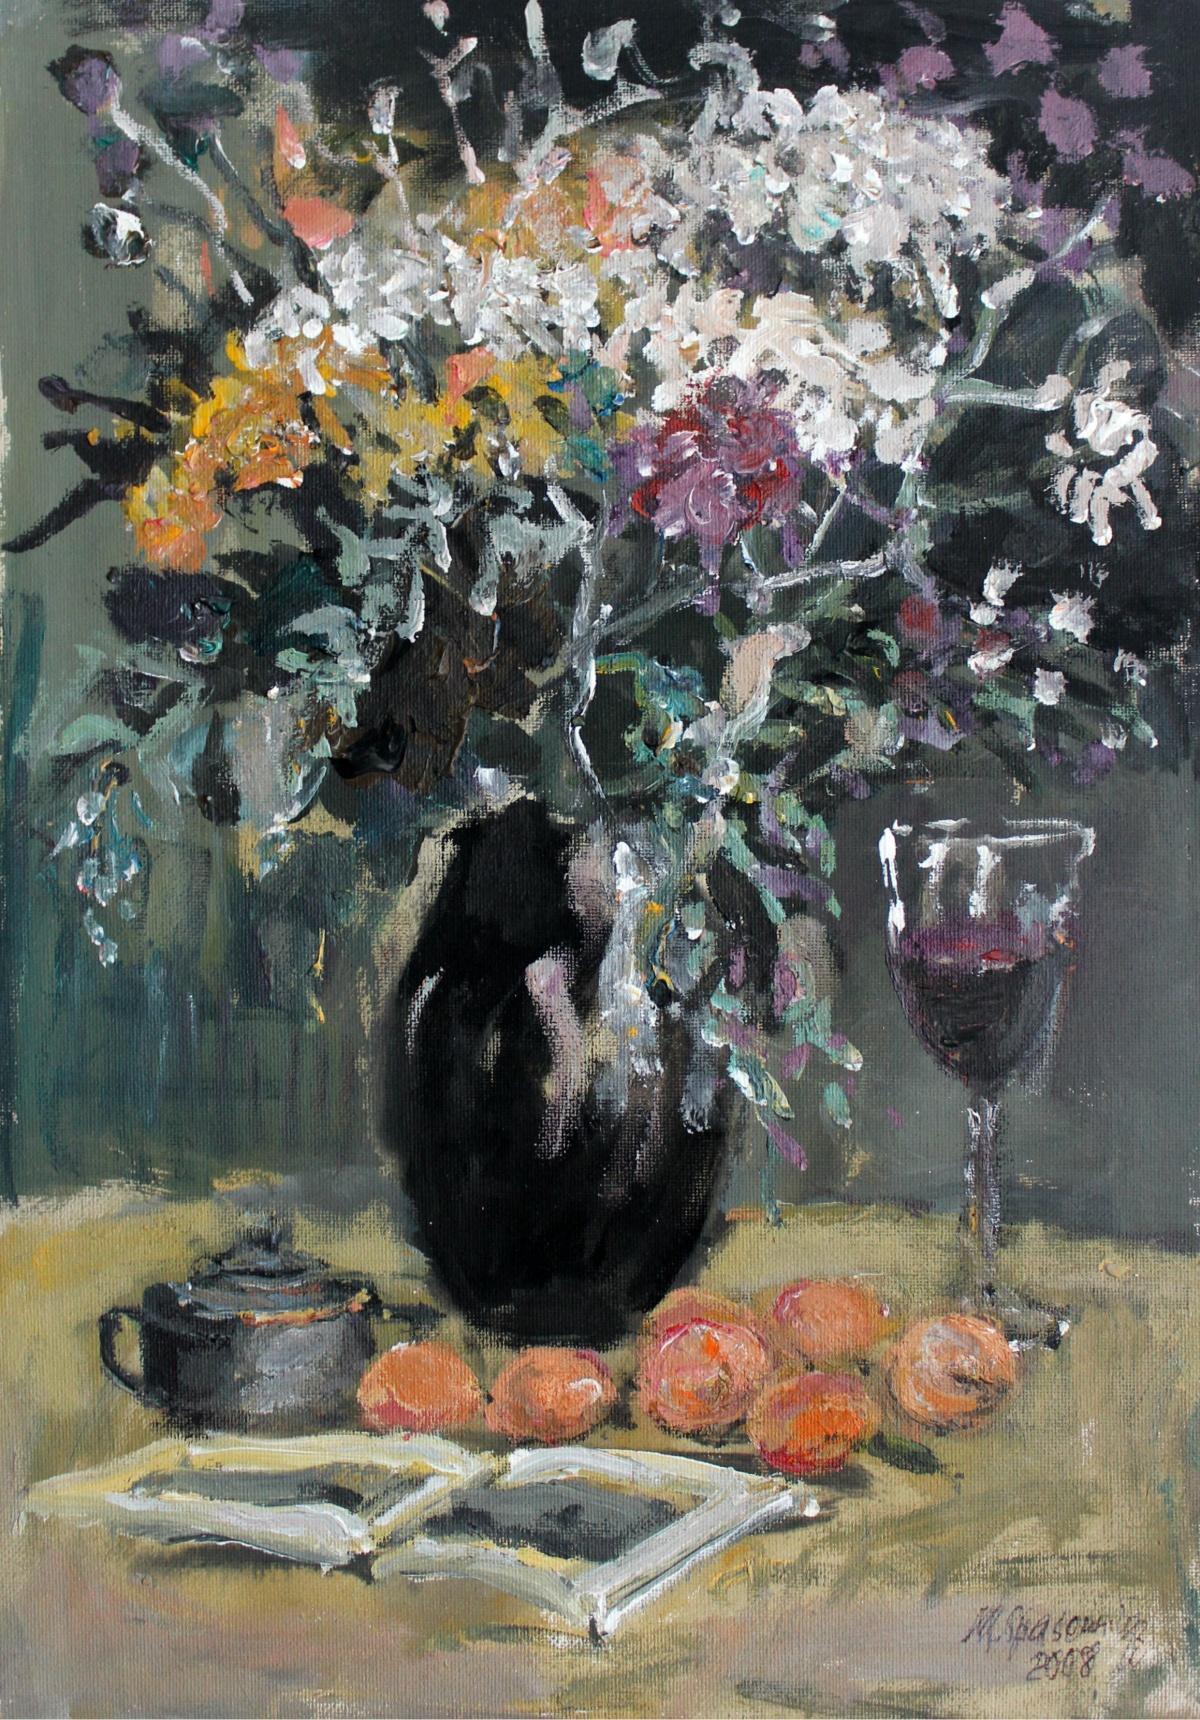 Still life - XXI century, Oil painting, Figurative, Grey tones